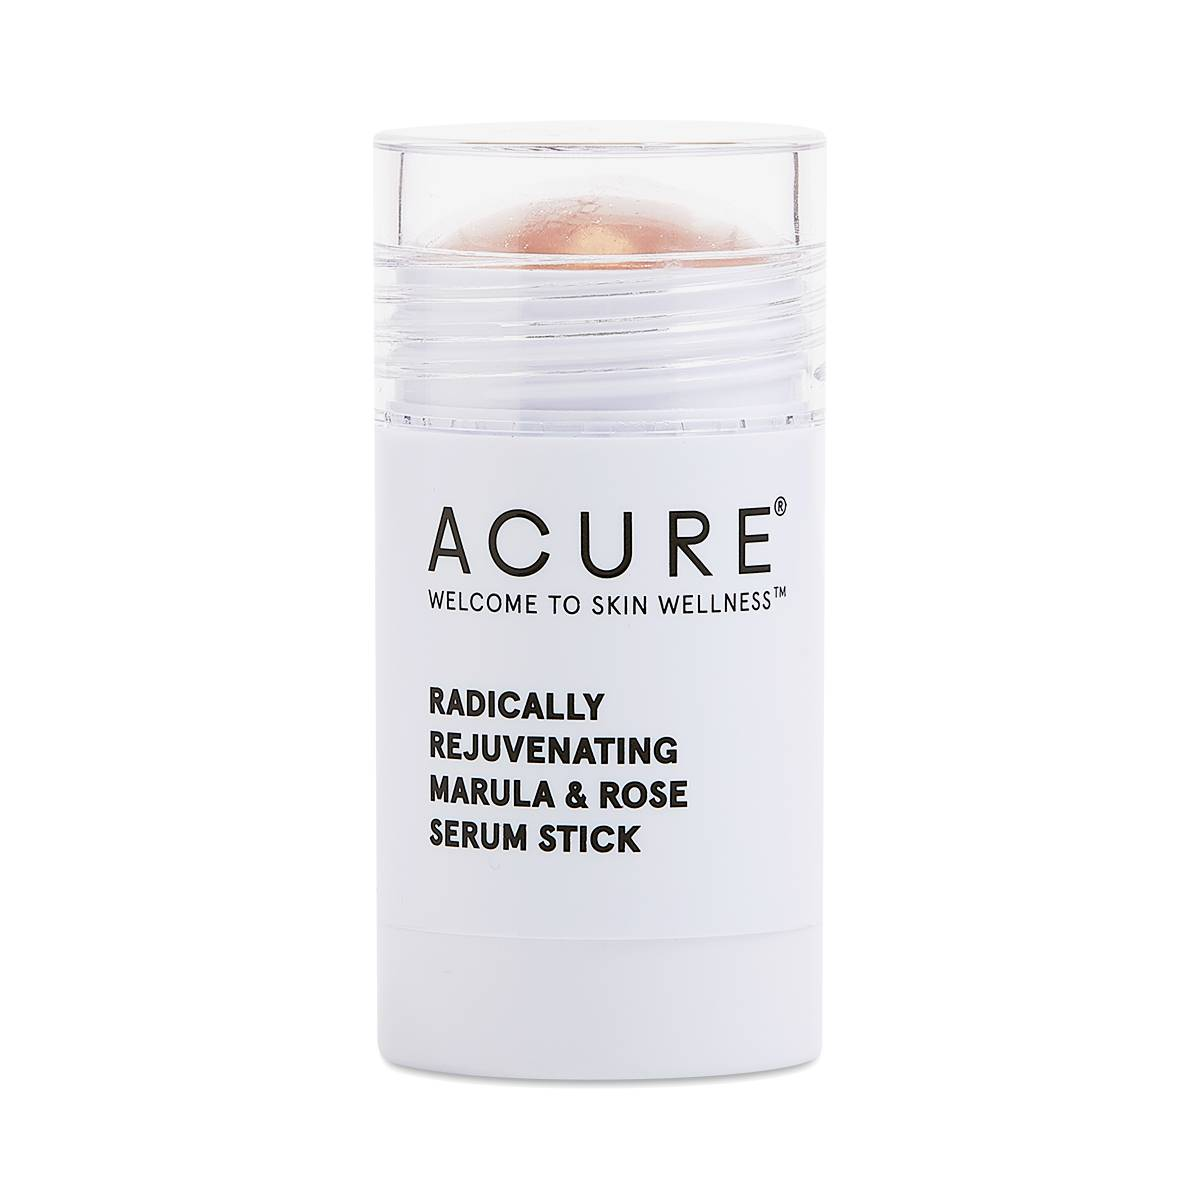 Radically Rejuvenating Serum Stick By ACURE